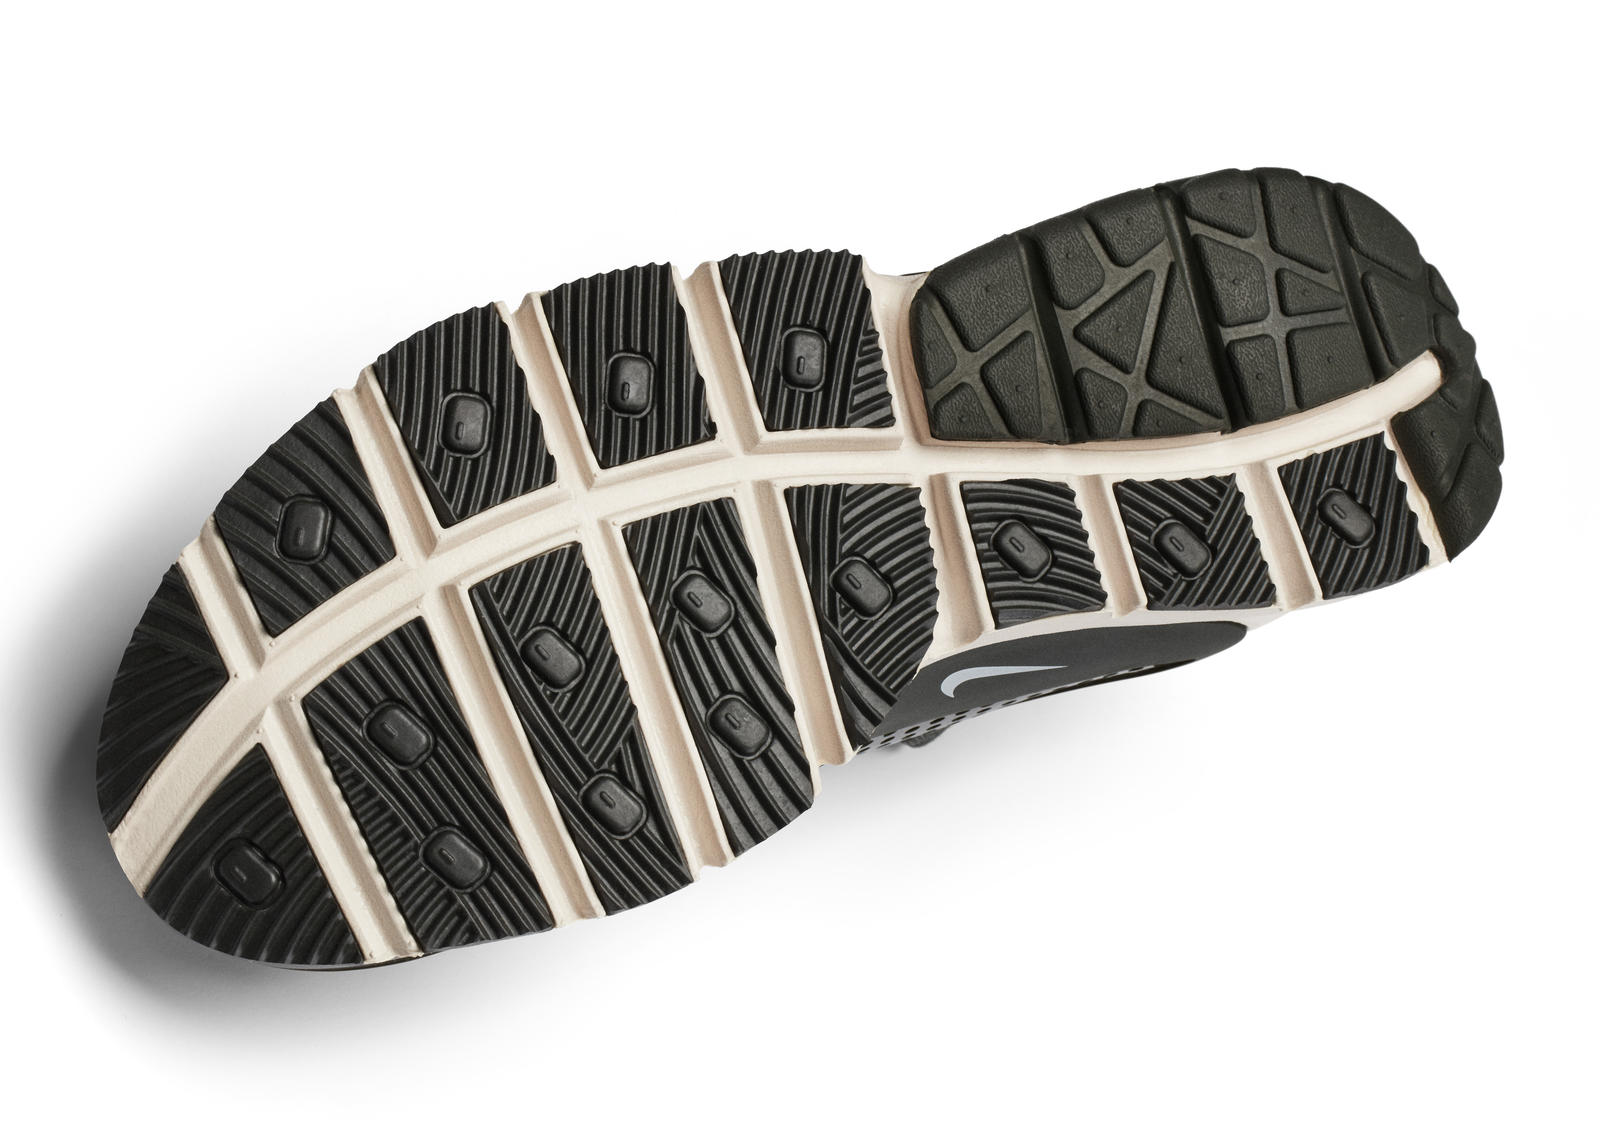 newest a8b51 20790 The NikeLab Sock Dart Mid x Stone Island - Nike News